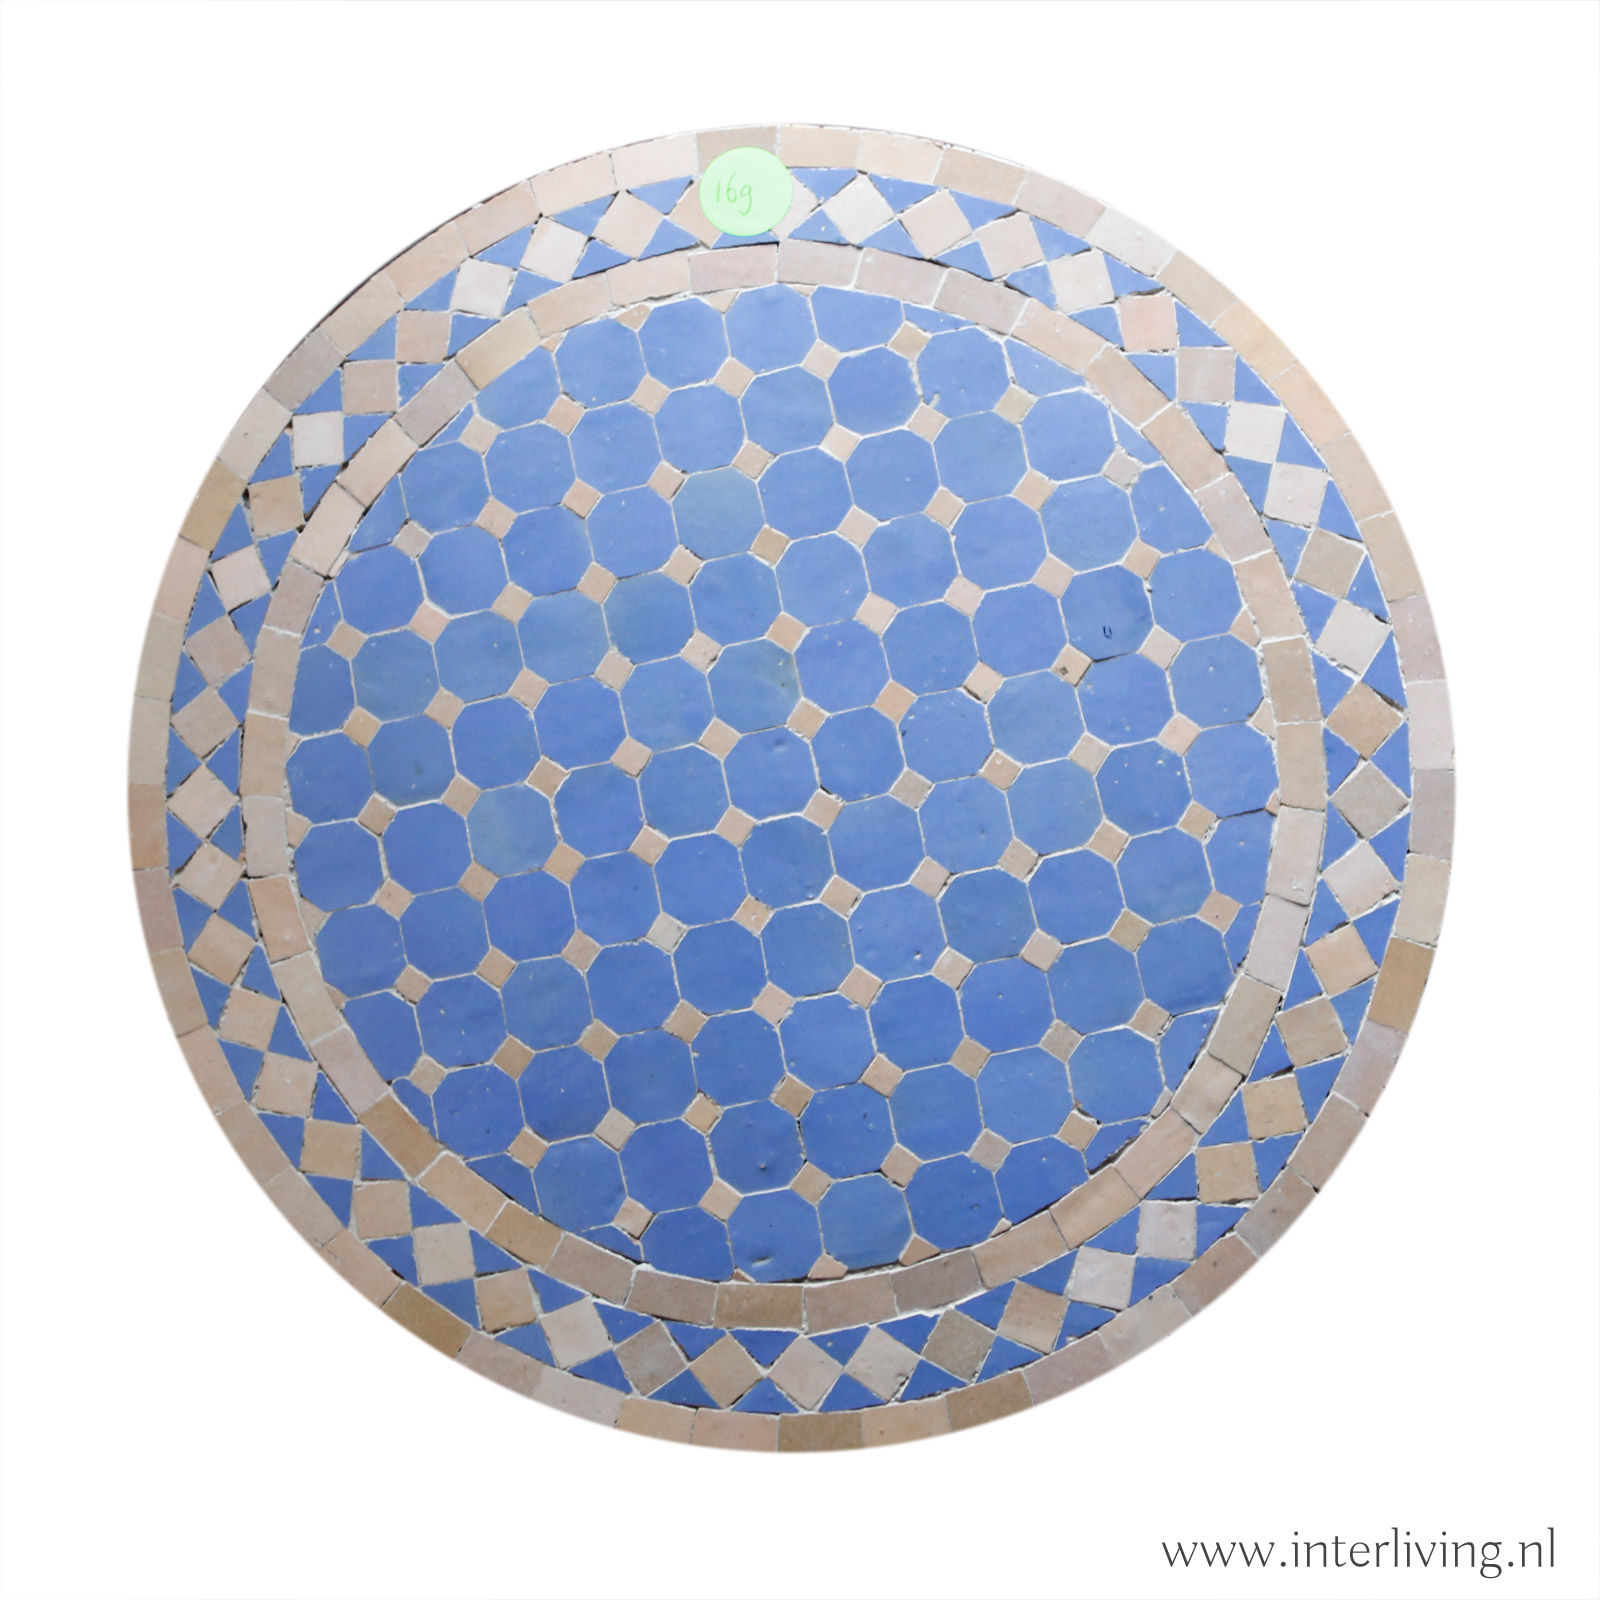 oosterse en bohemian wandlamp met houtsnijwerk - kleurrijke Marokkaanse stijl met glasmozaïek